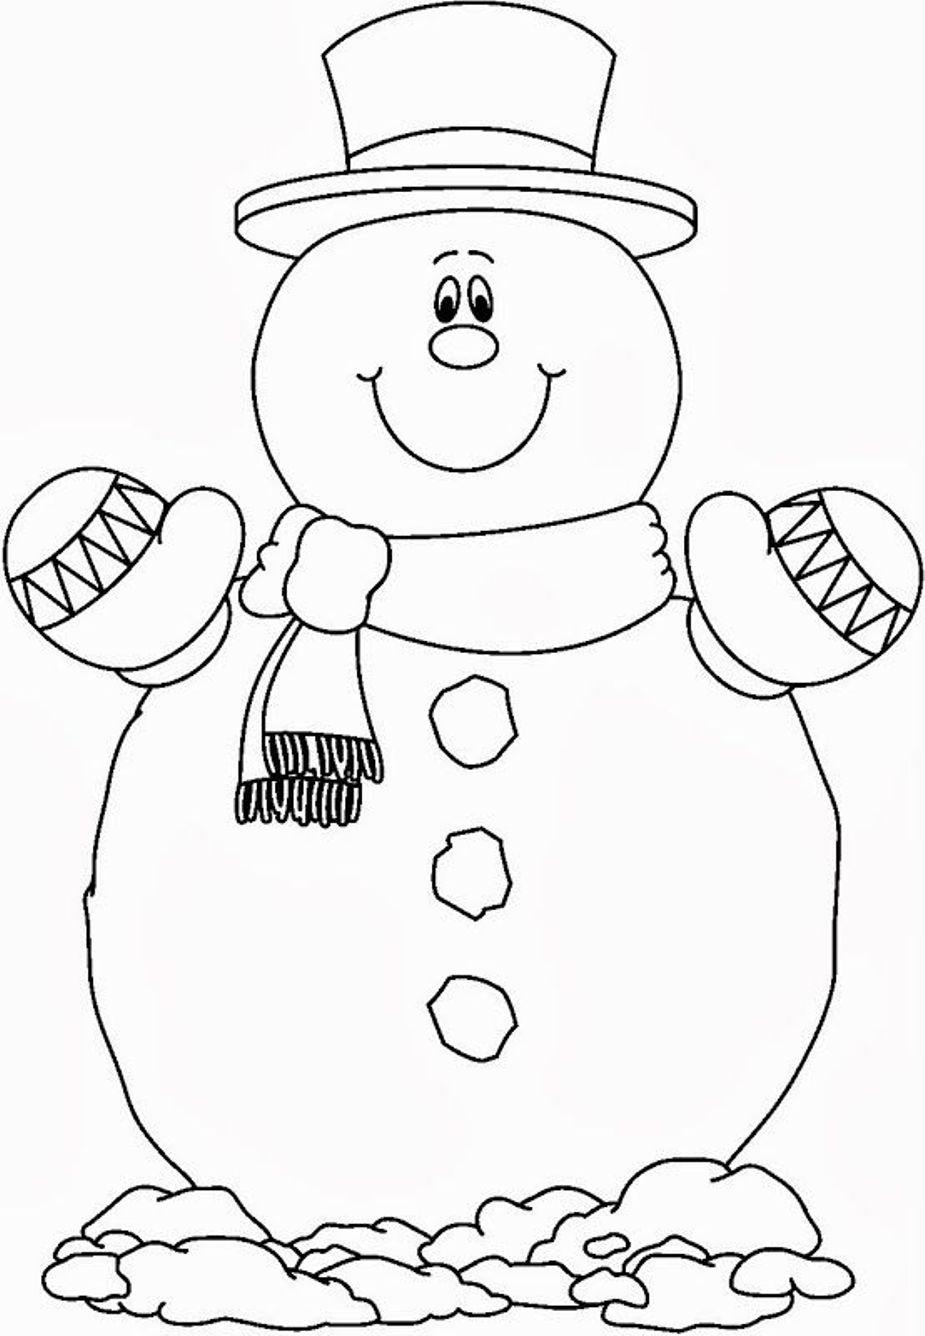 925x1336 Snowman Coloring Pages